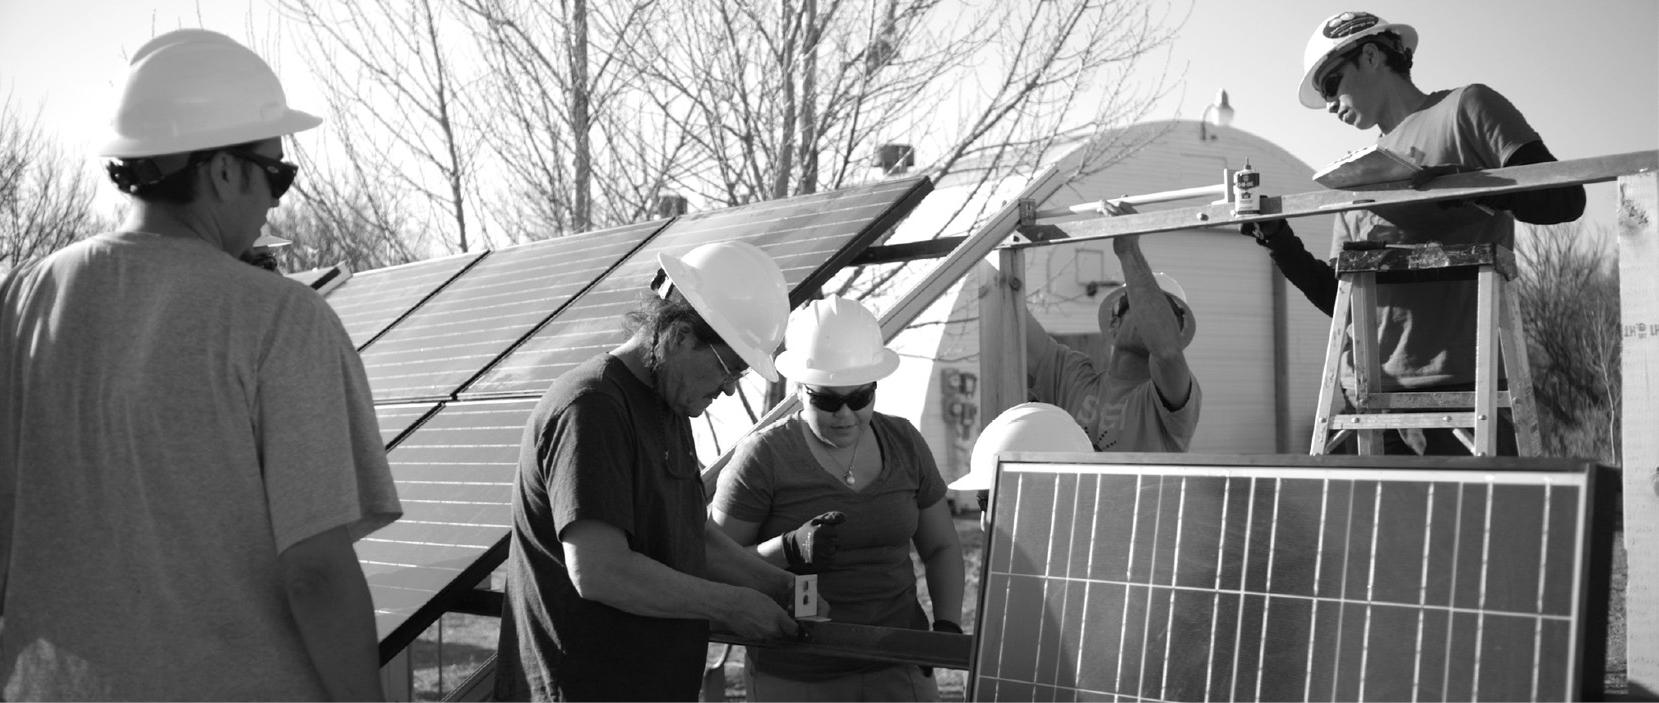 NK solar warriors